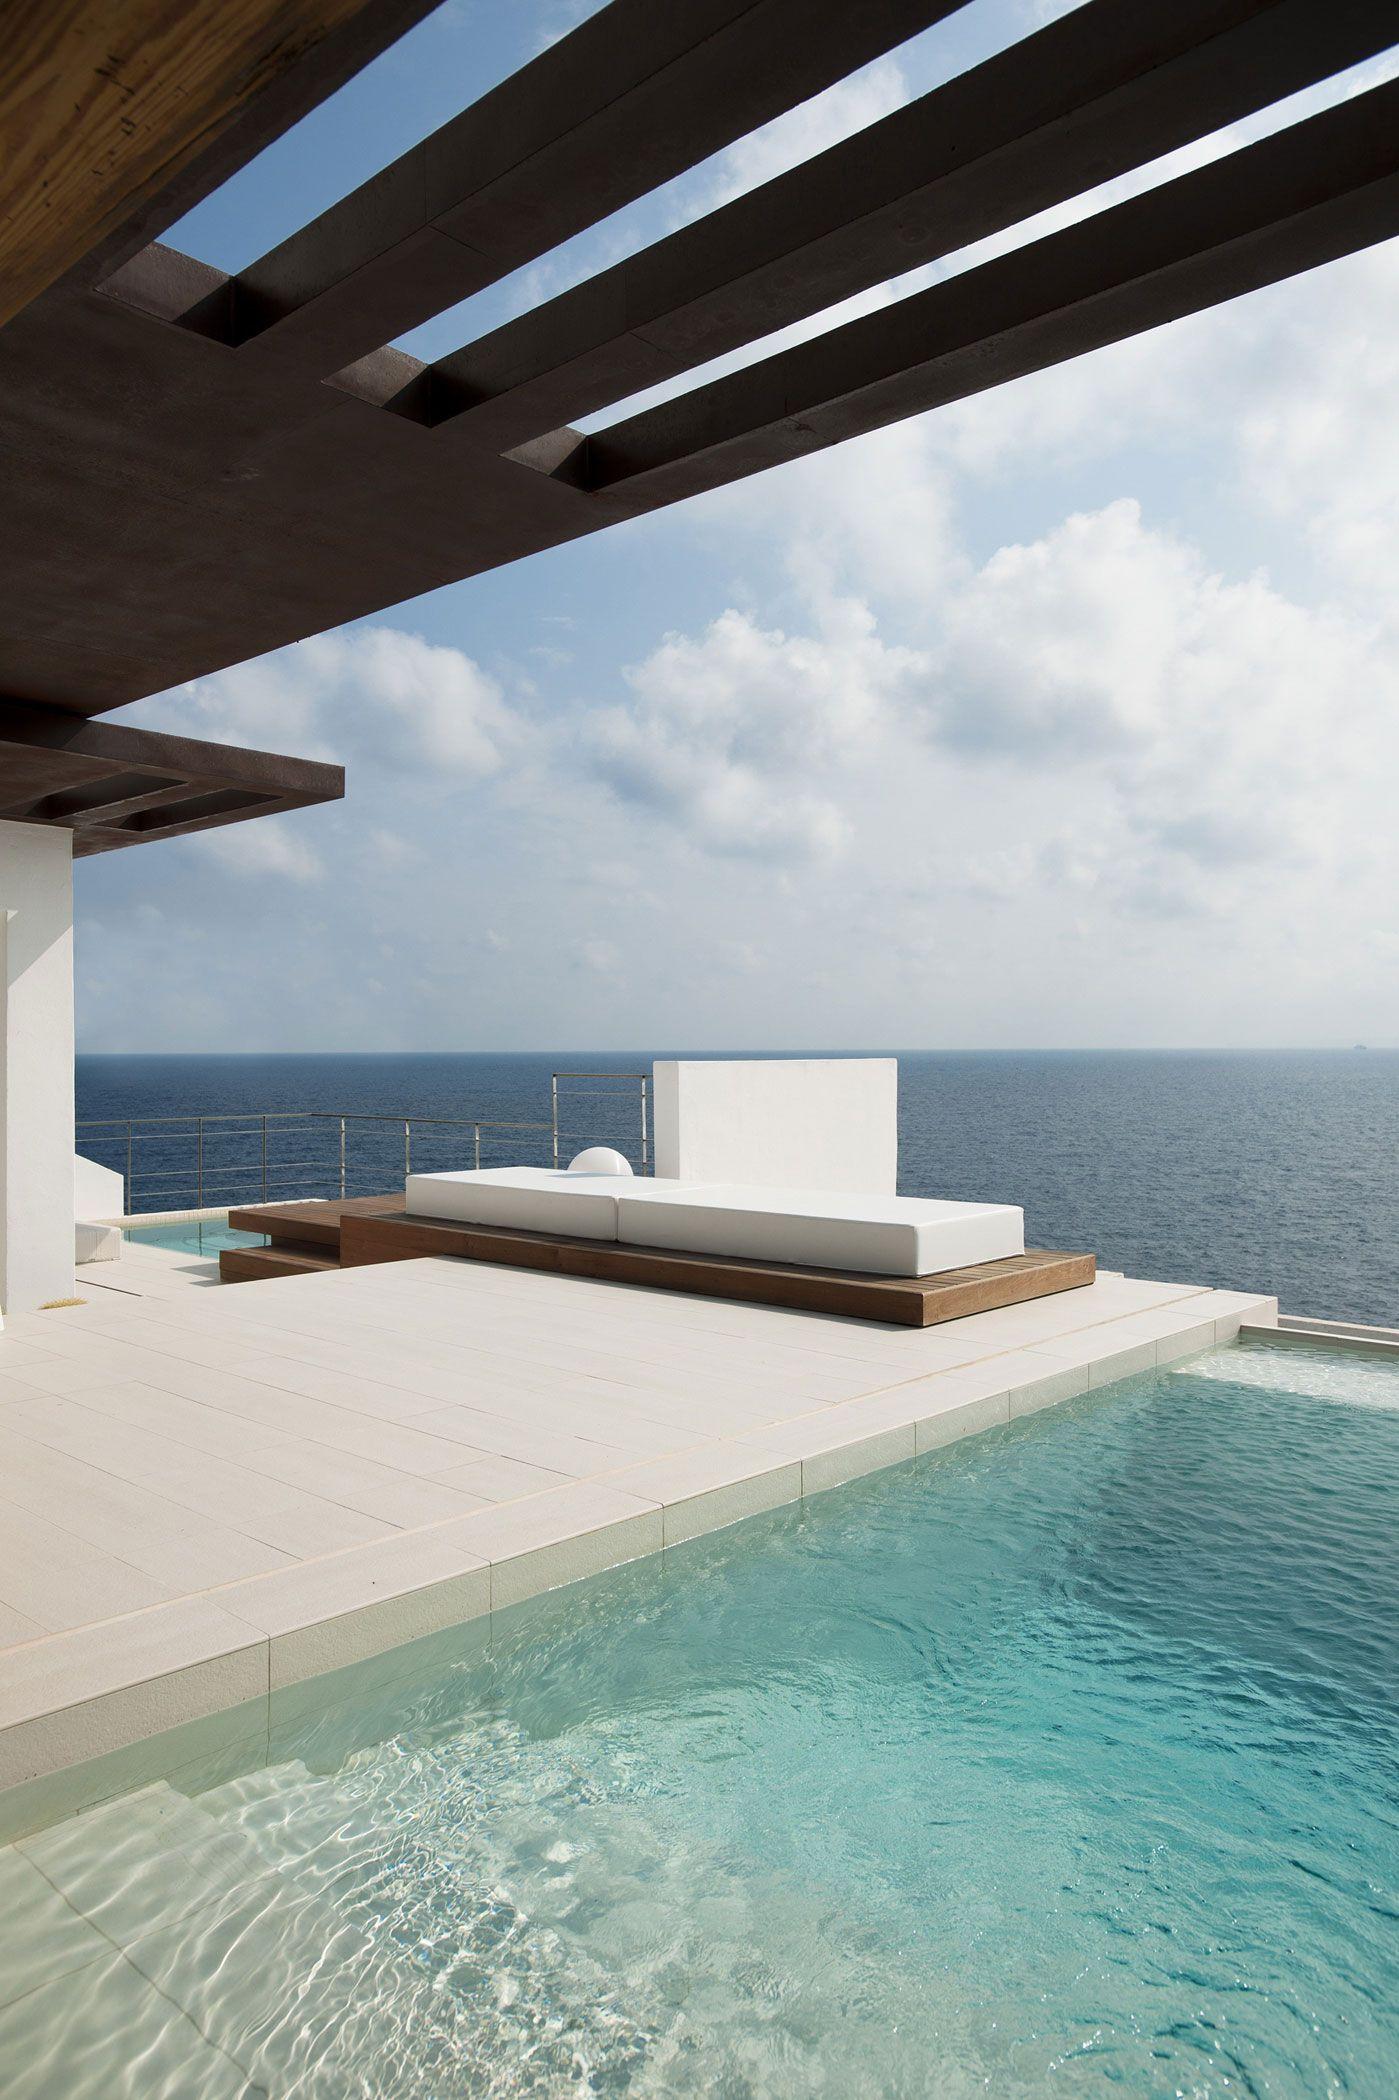 'Dupli Dos' by Juma Architects | Ibiza, Spain #architecture #design #spain